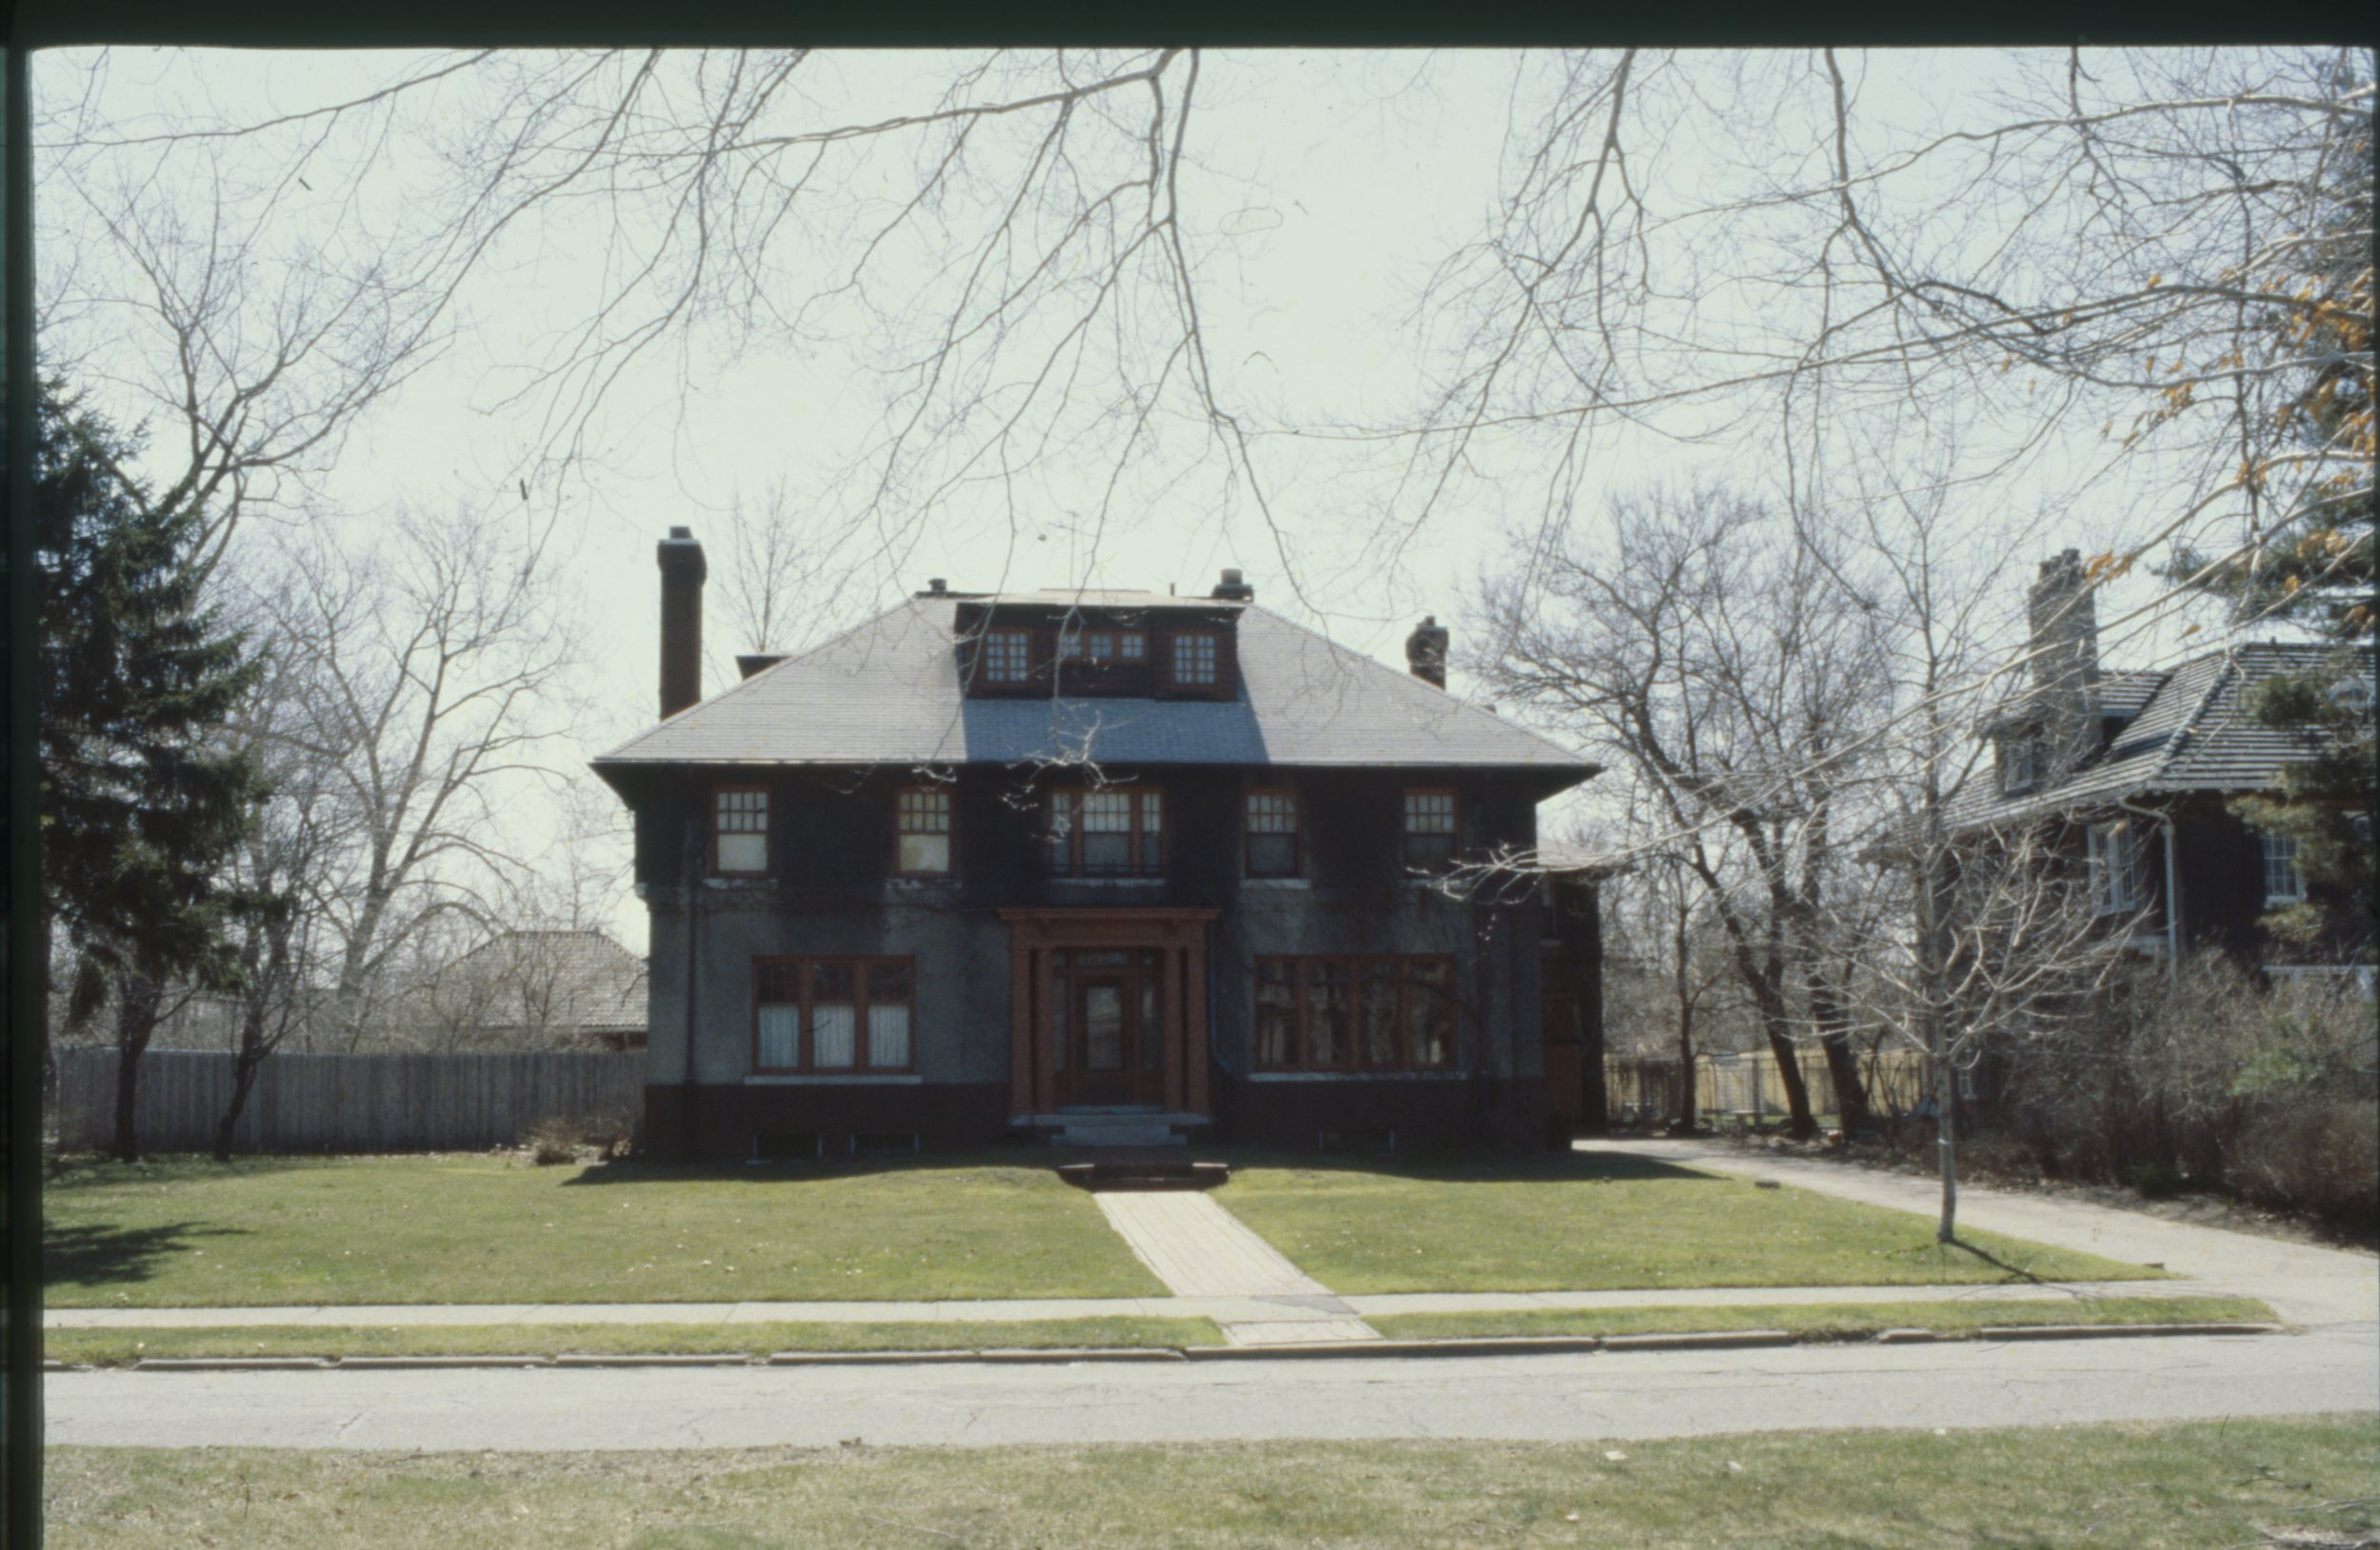 121 W. Boston 1980.jpg